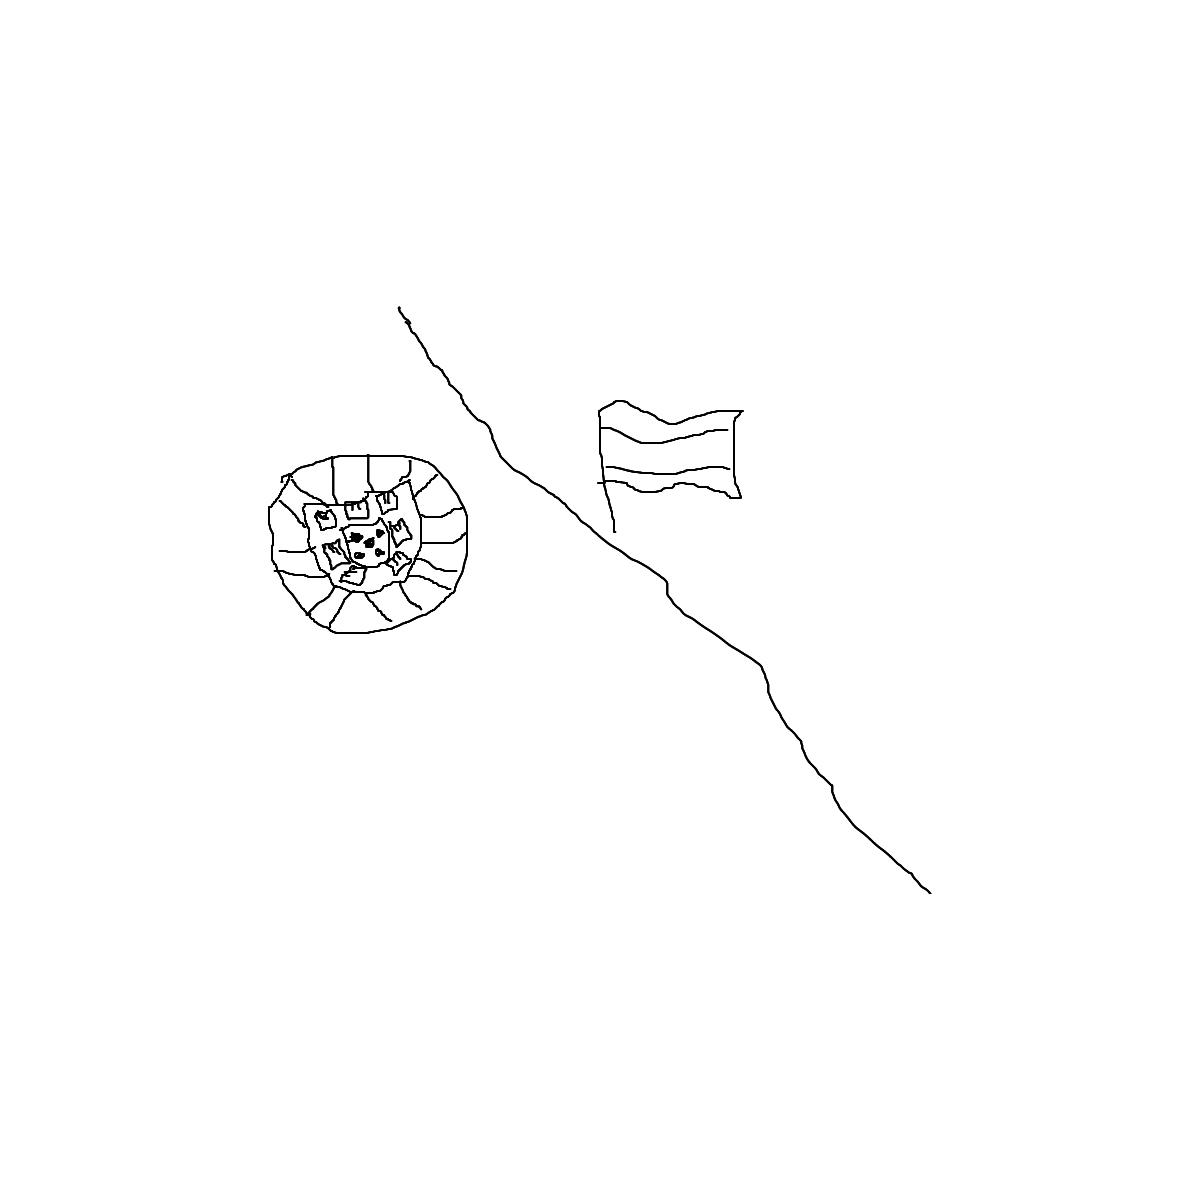 BAAAM drawing#6046 lat:41.7416877746582000lng: -6.5655465126037600